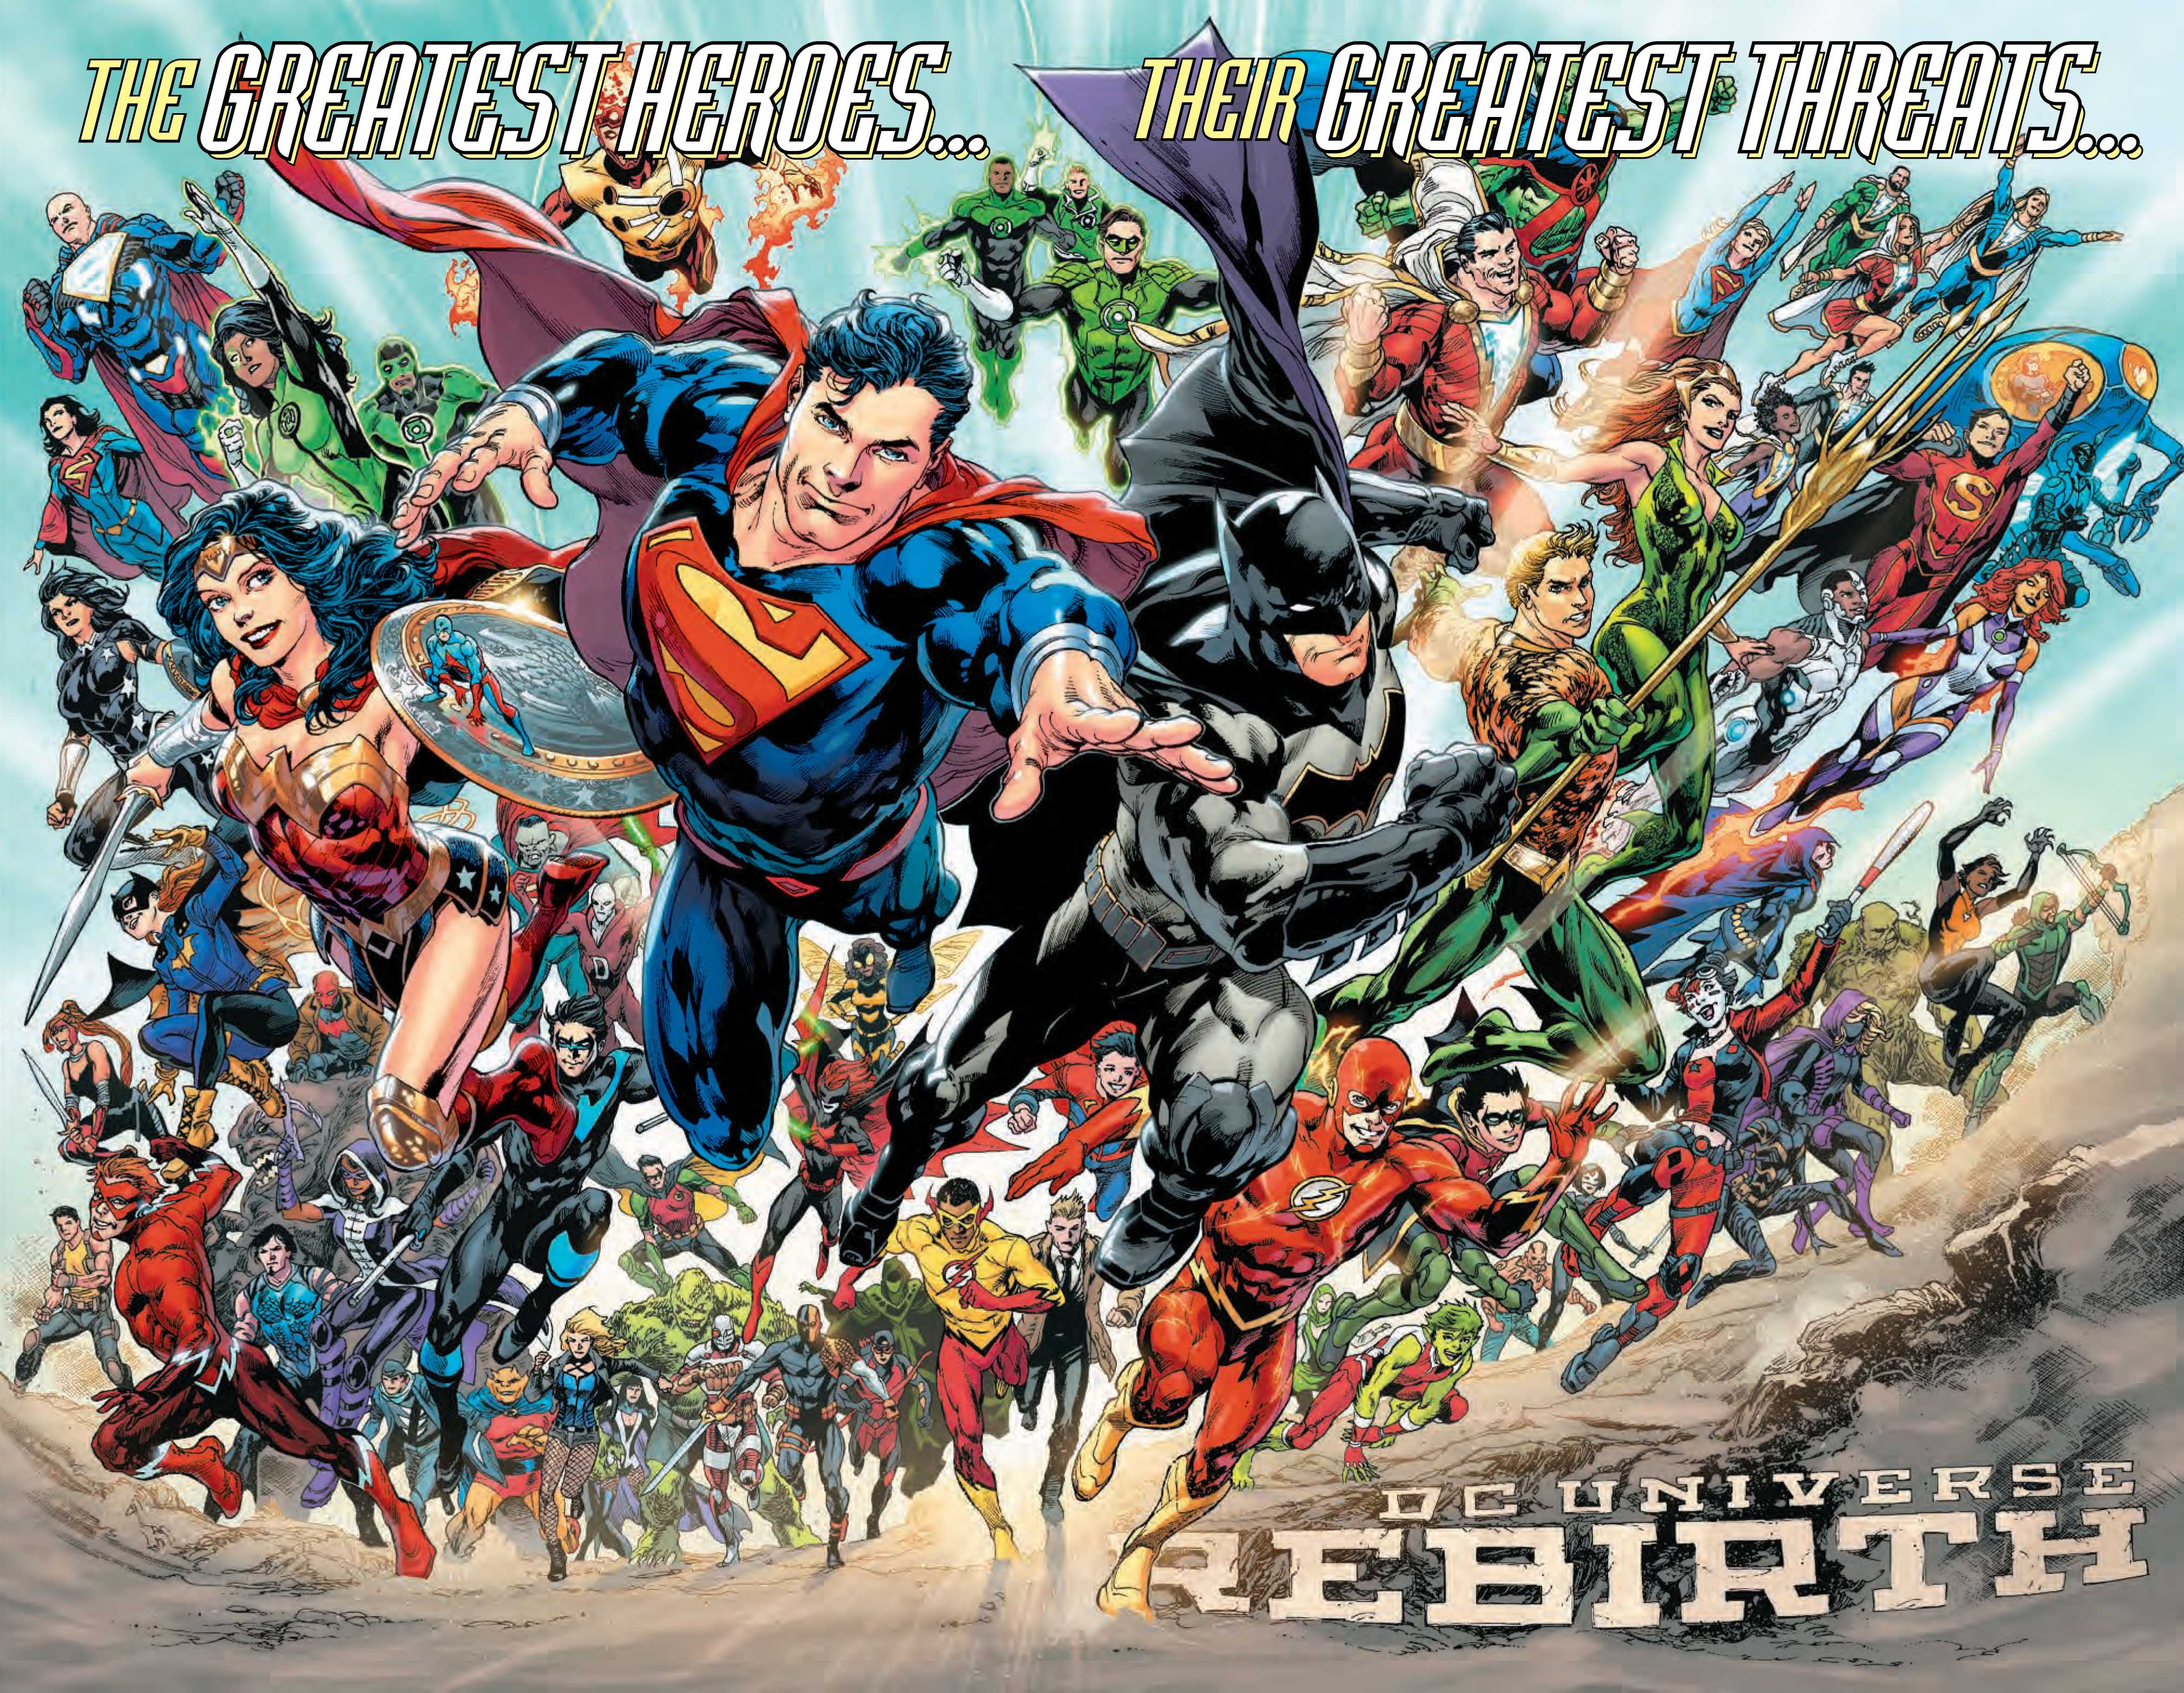 DC Super Heroes : The Ultimate Pop-Up Book by Matthew Reinhart